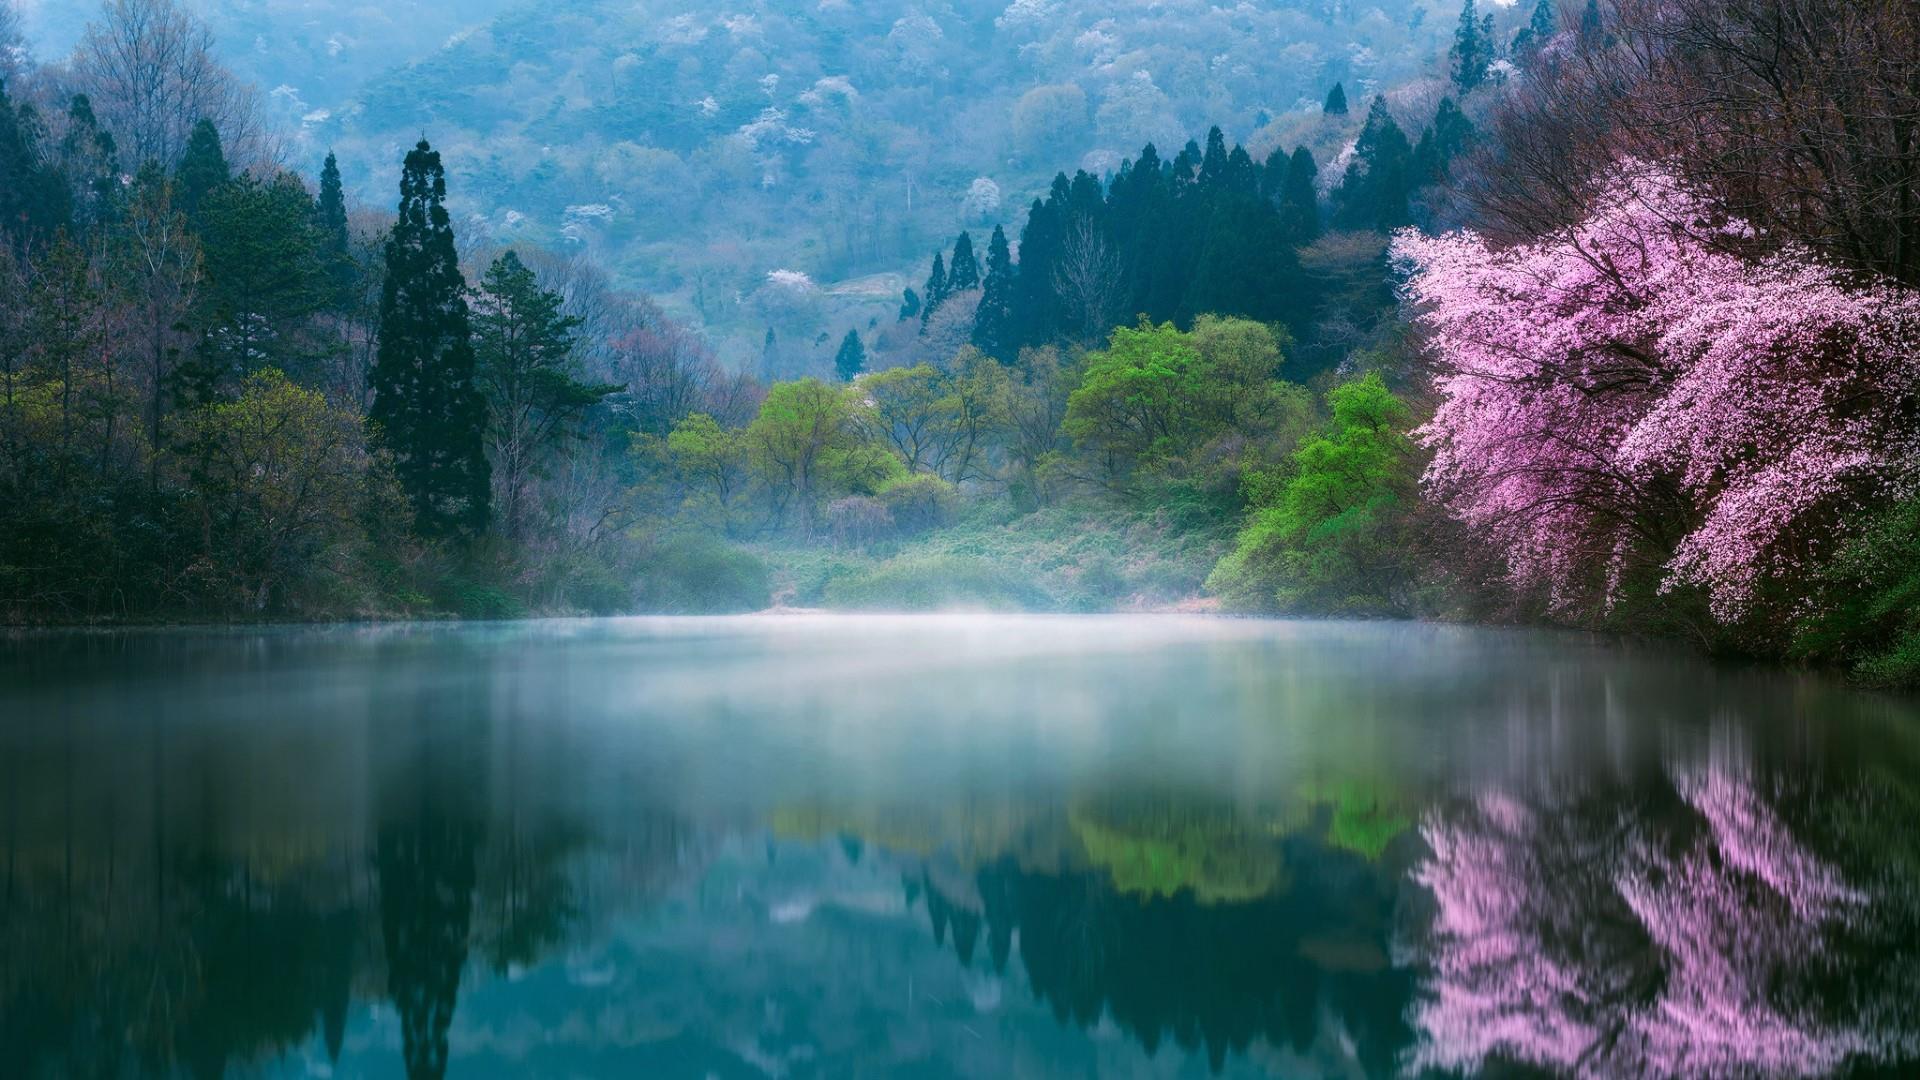 Lake in South Korea wallpaper